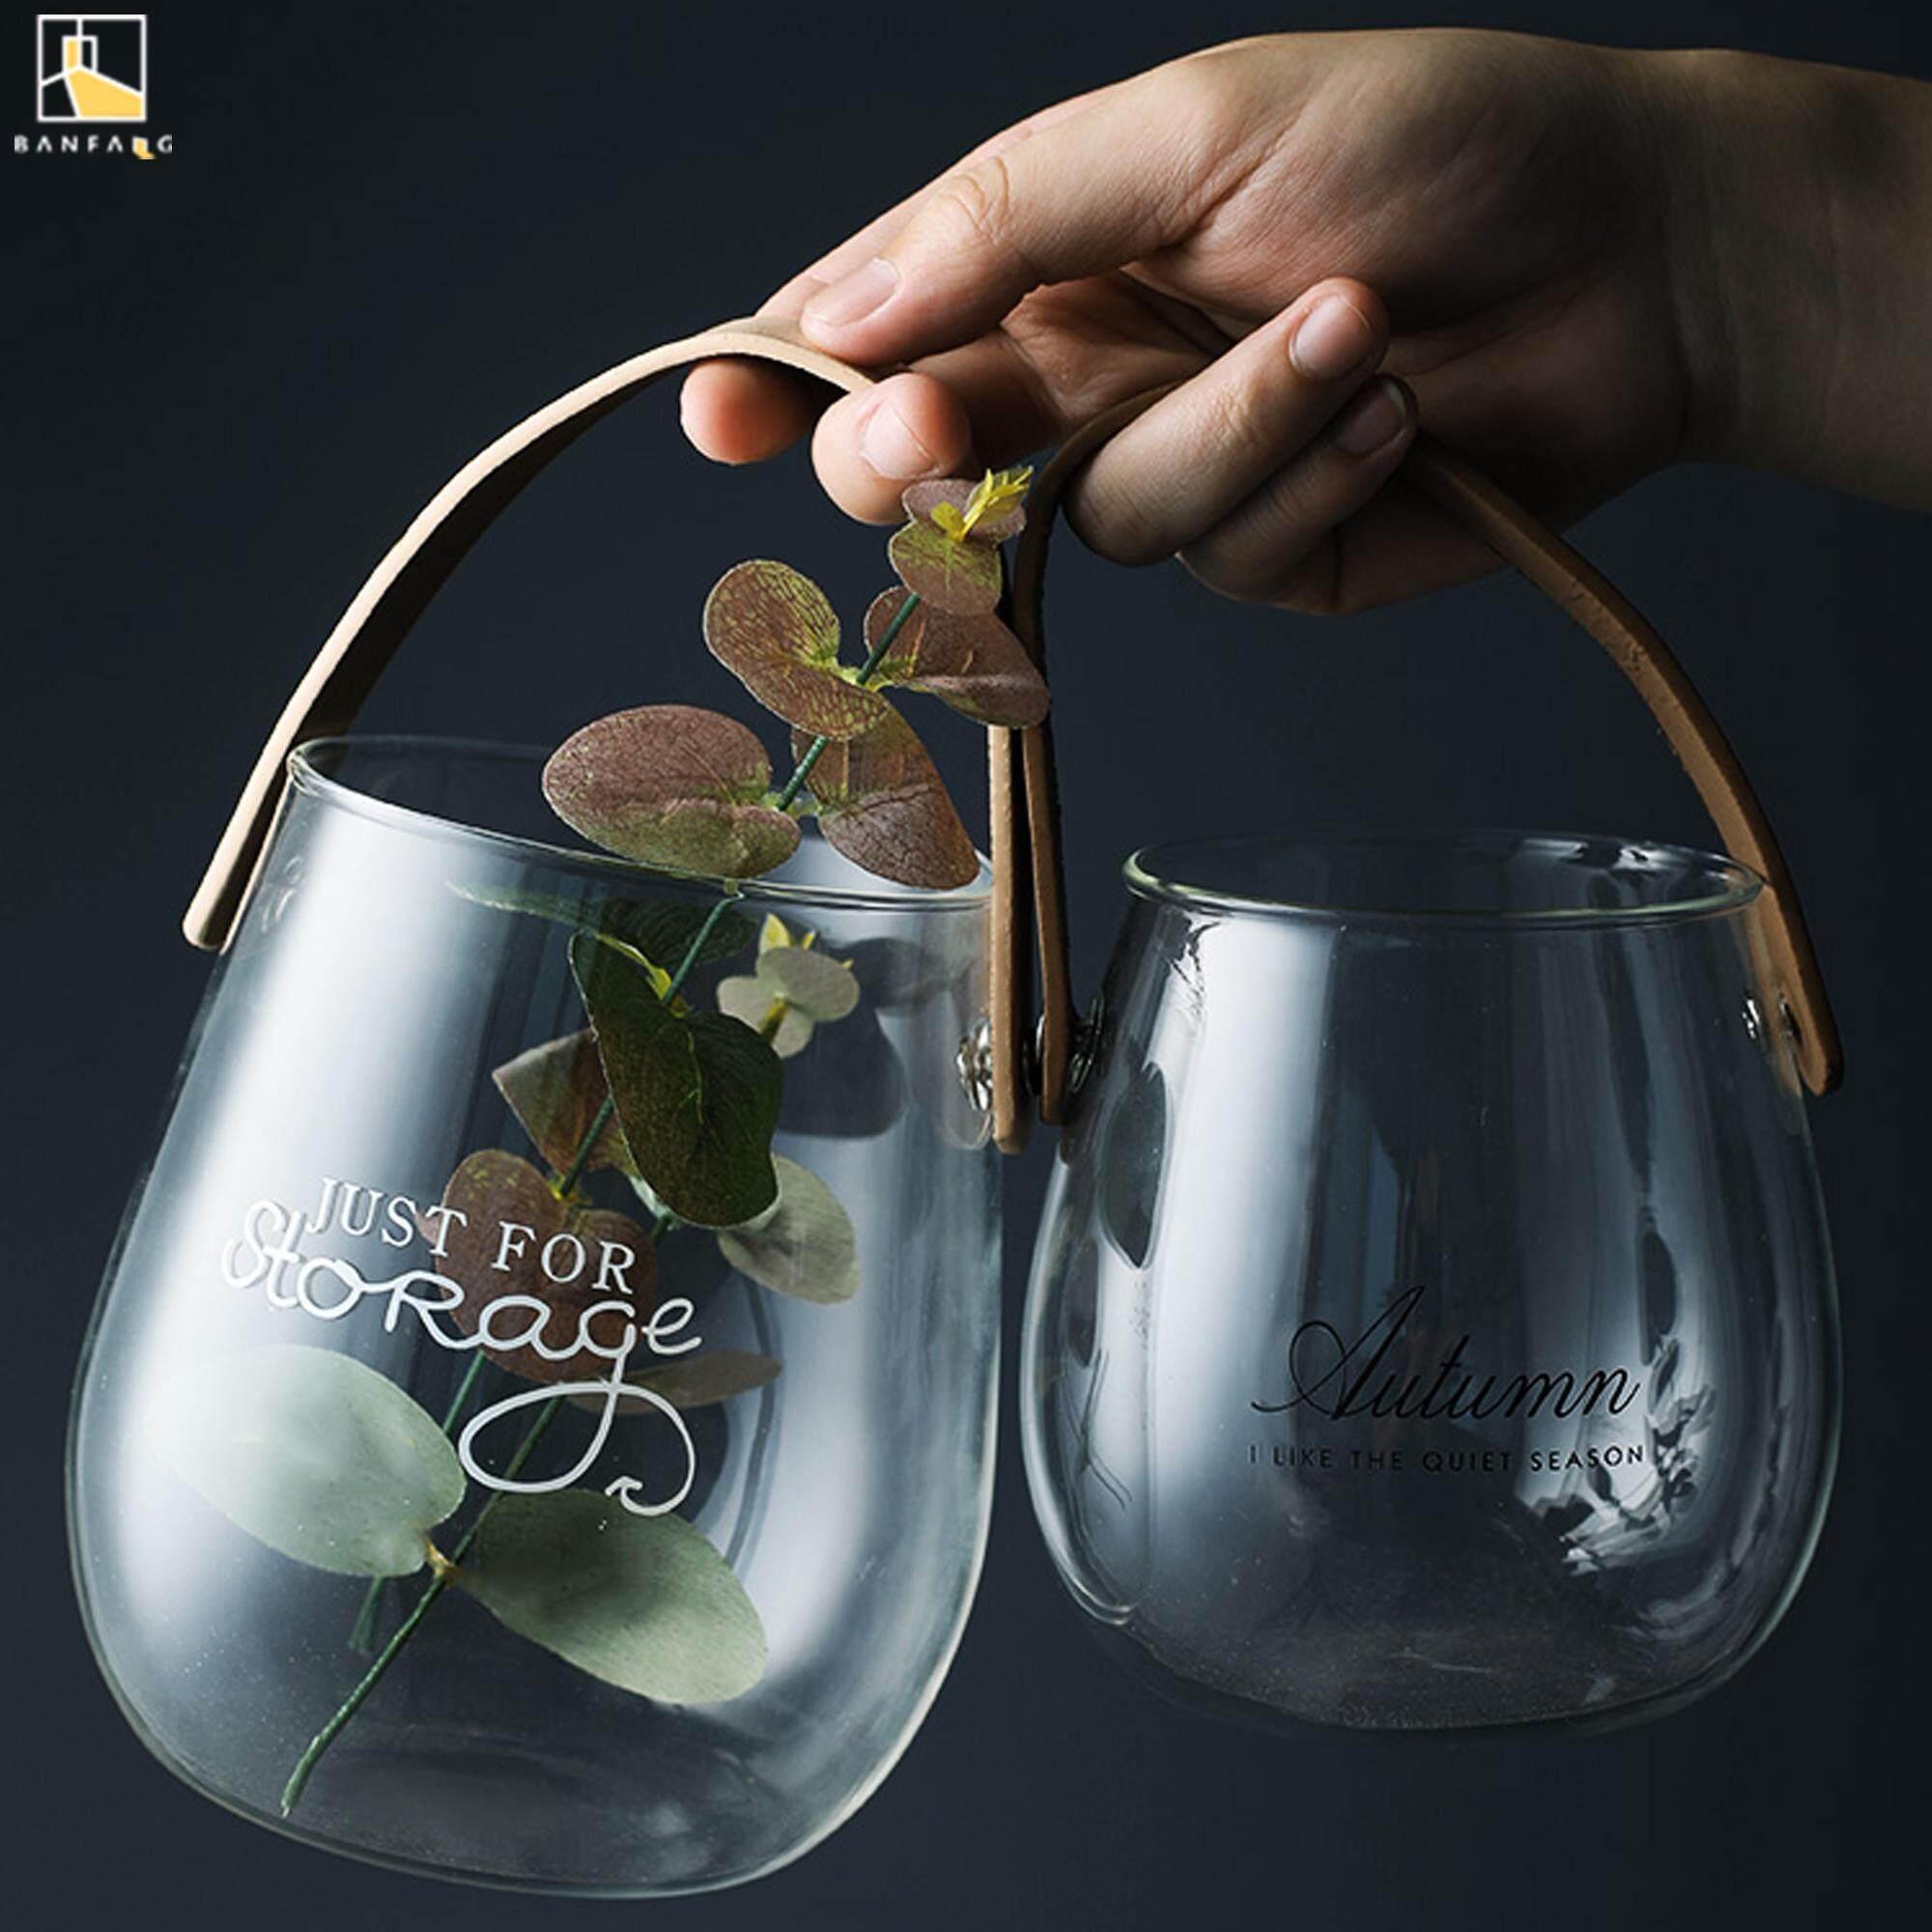 BANFANG Nordic glass vase with handle English letters hydroponic vase creative fruit snacks storage jar